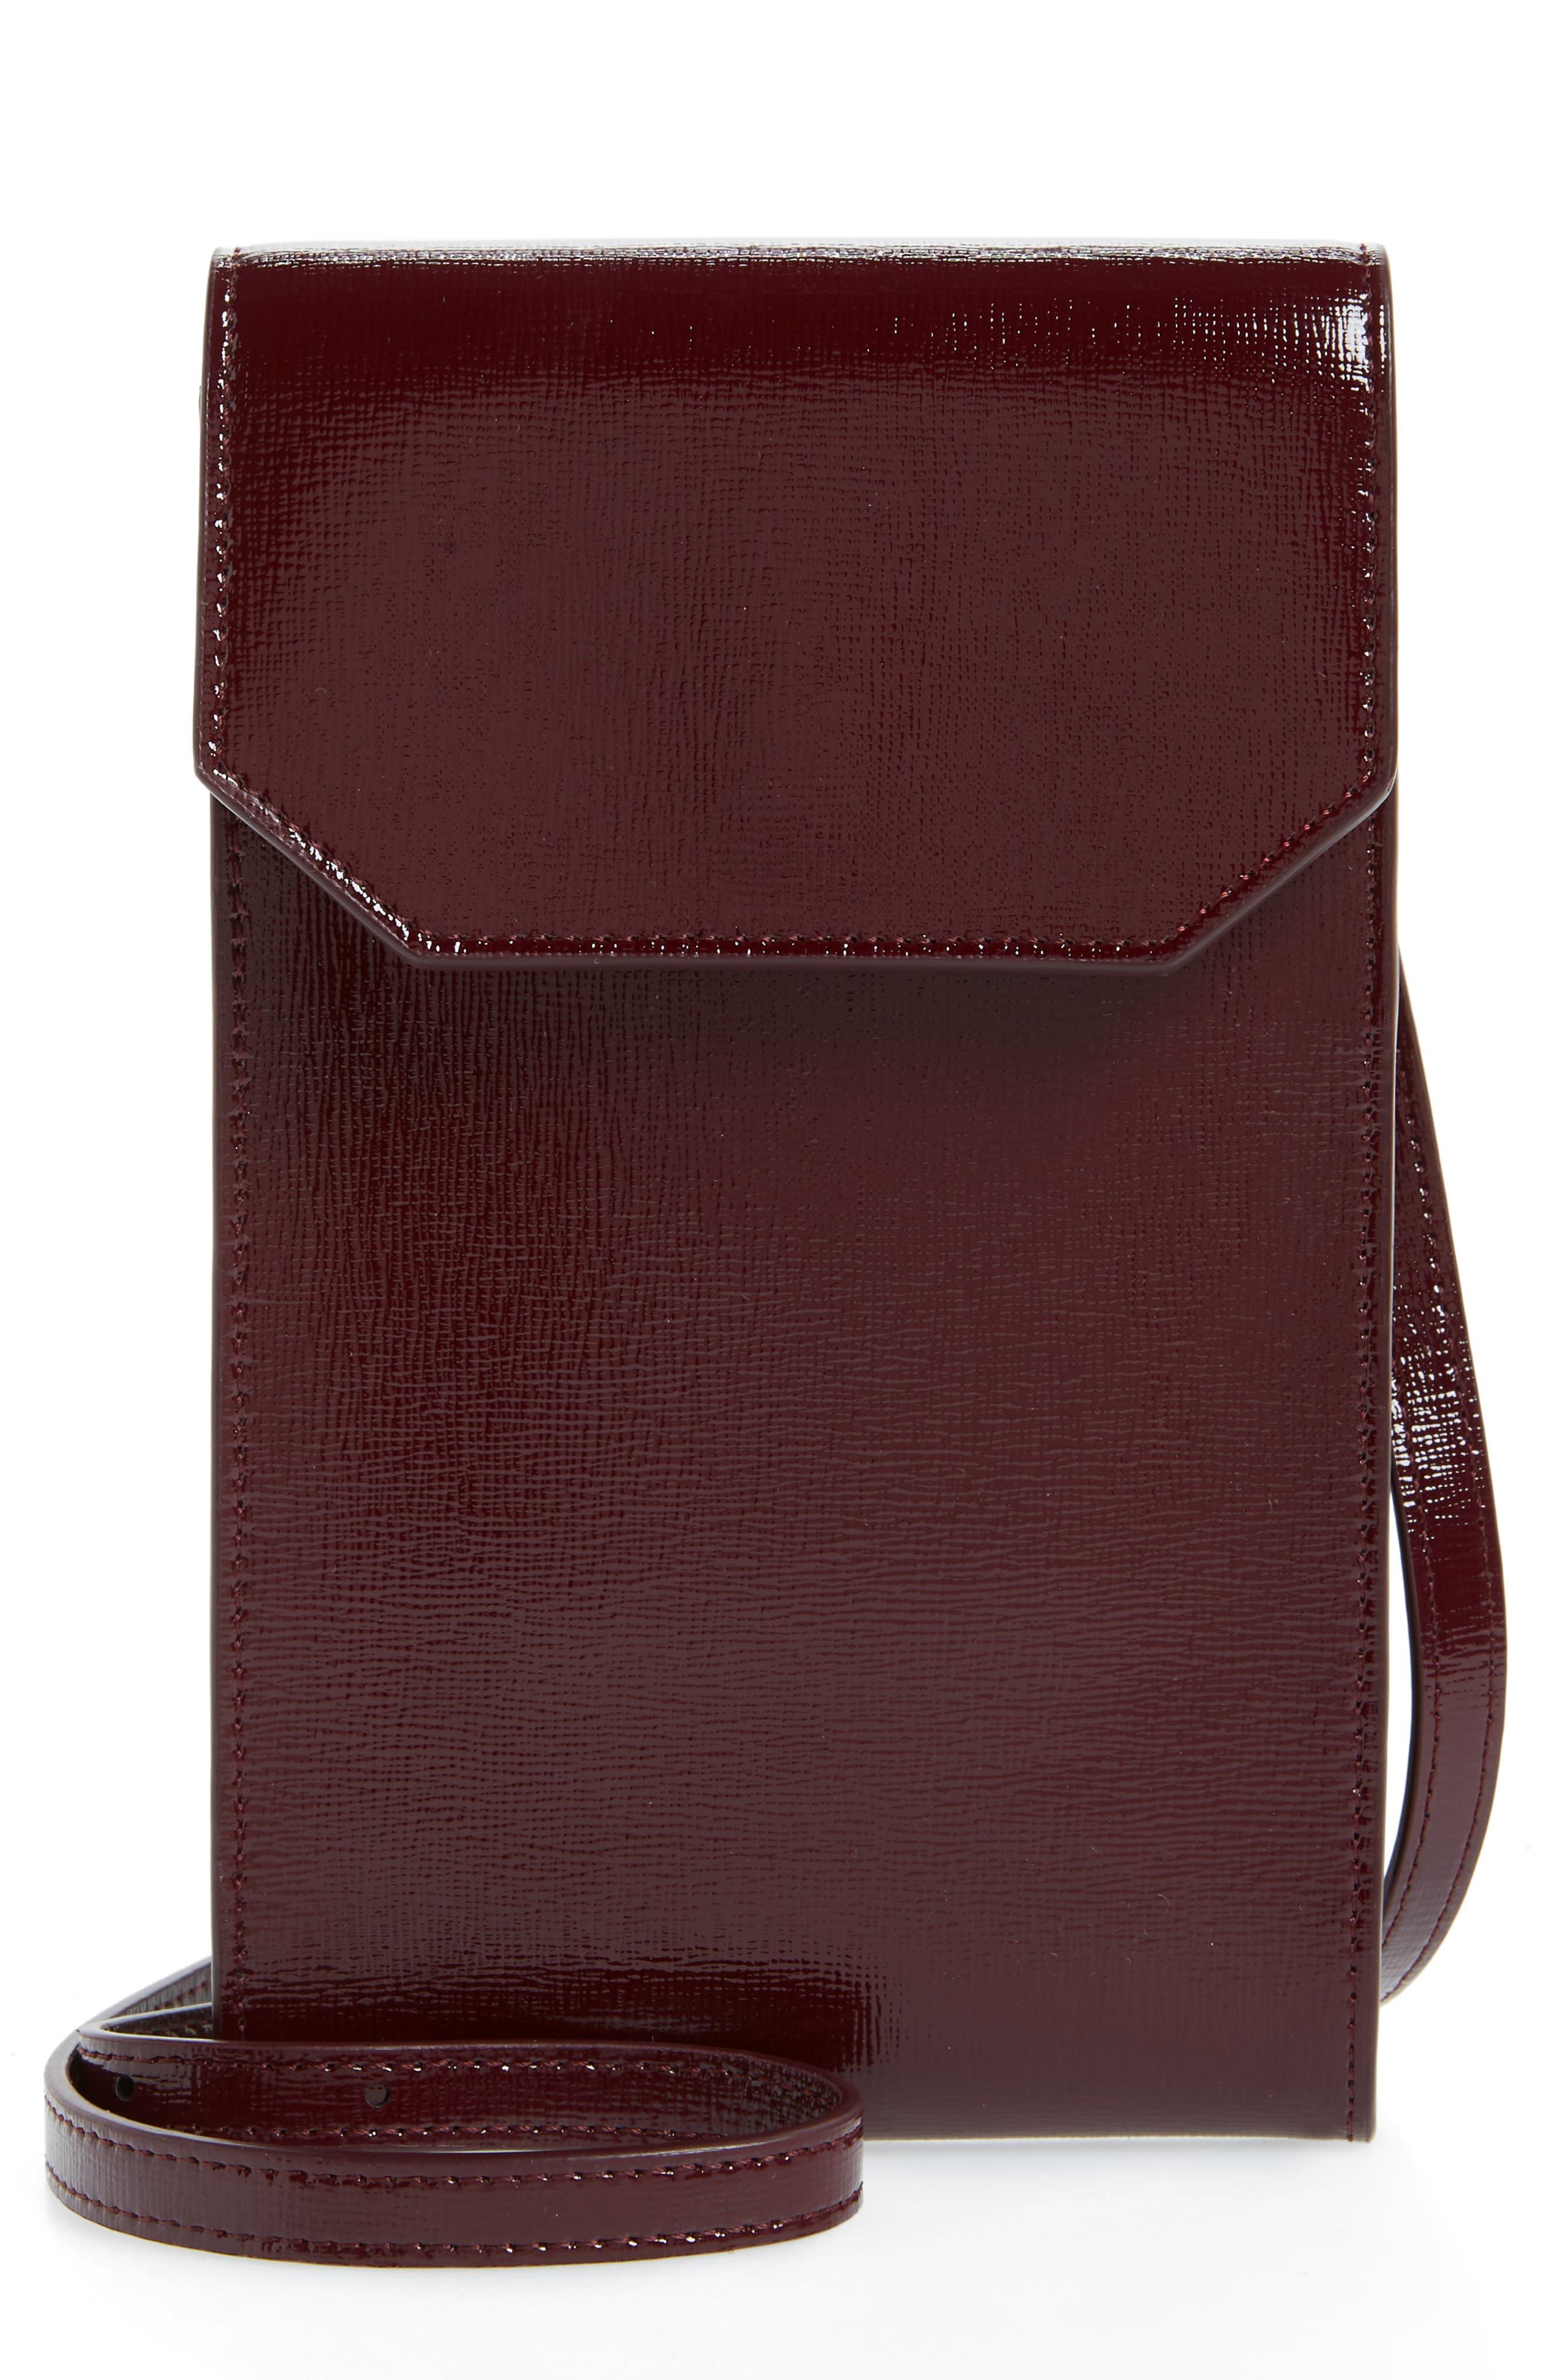 Leather Phone Crossbody Bag,                             Main thumbnail 1, color,                             Burgundy Royale